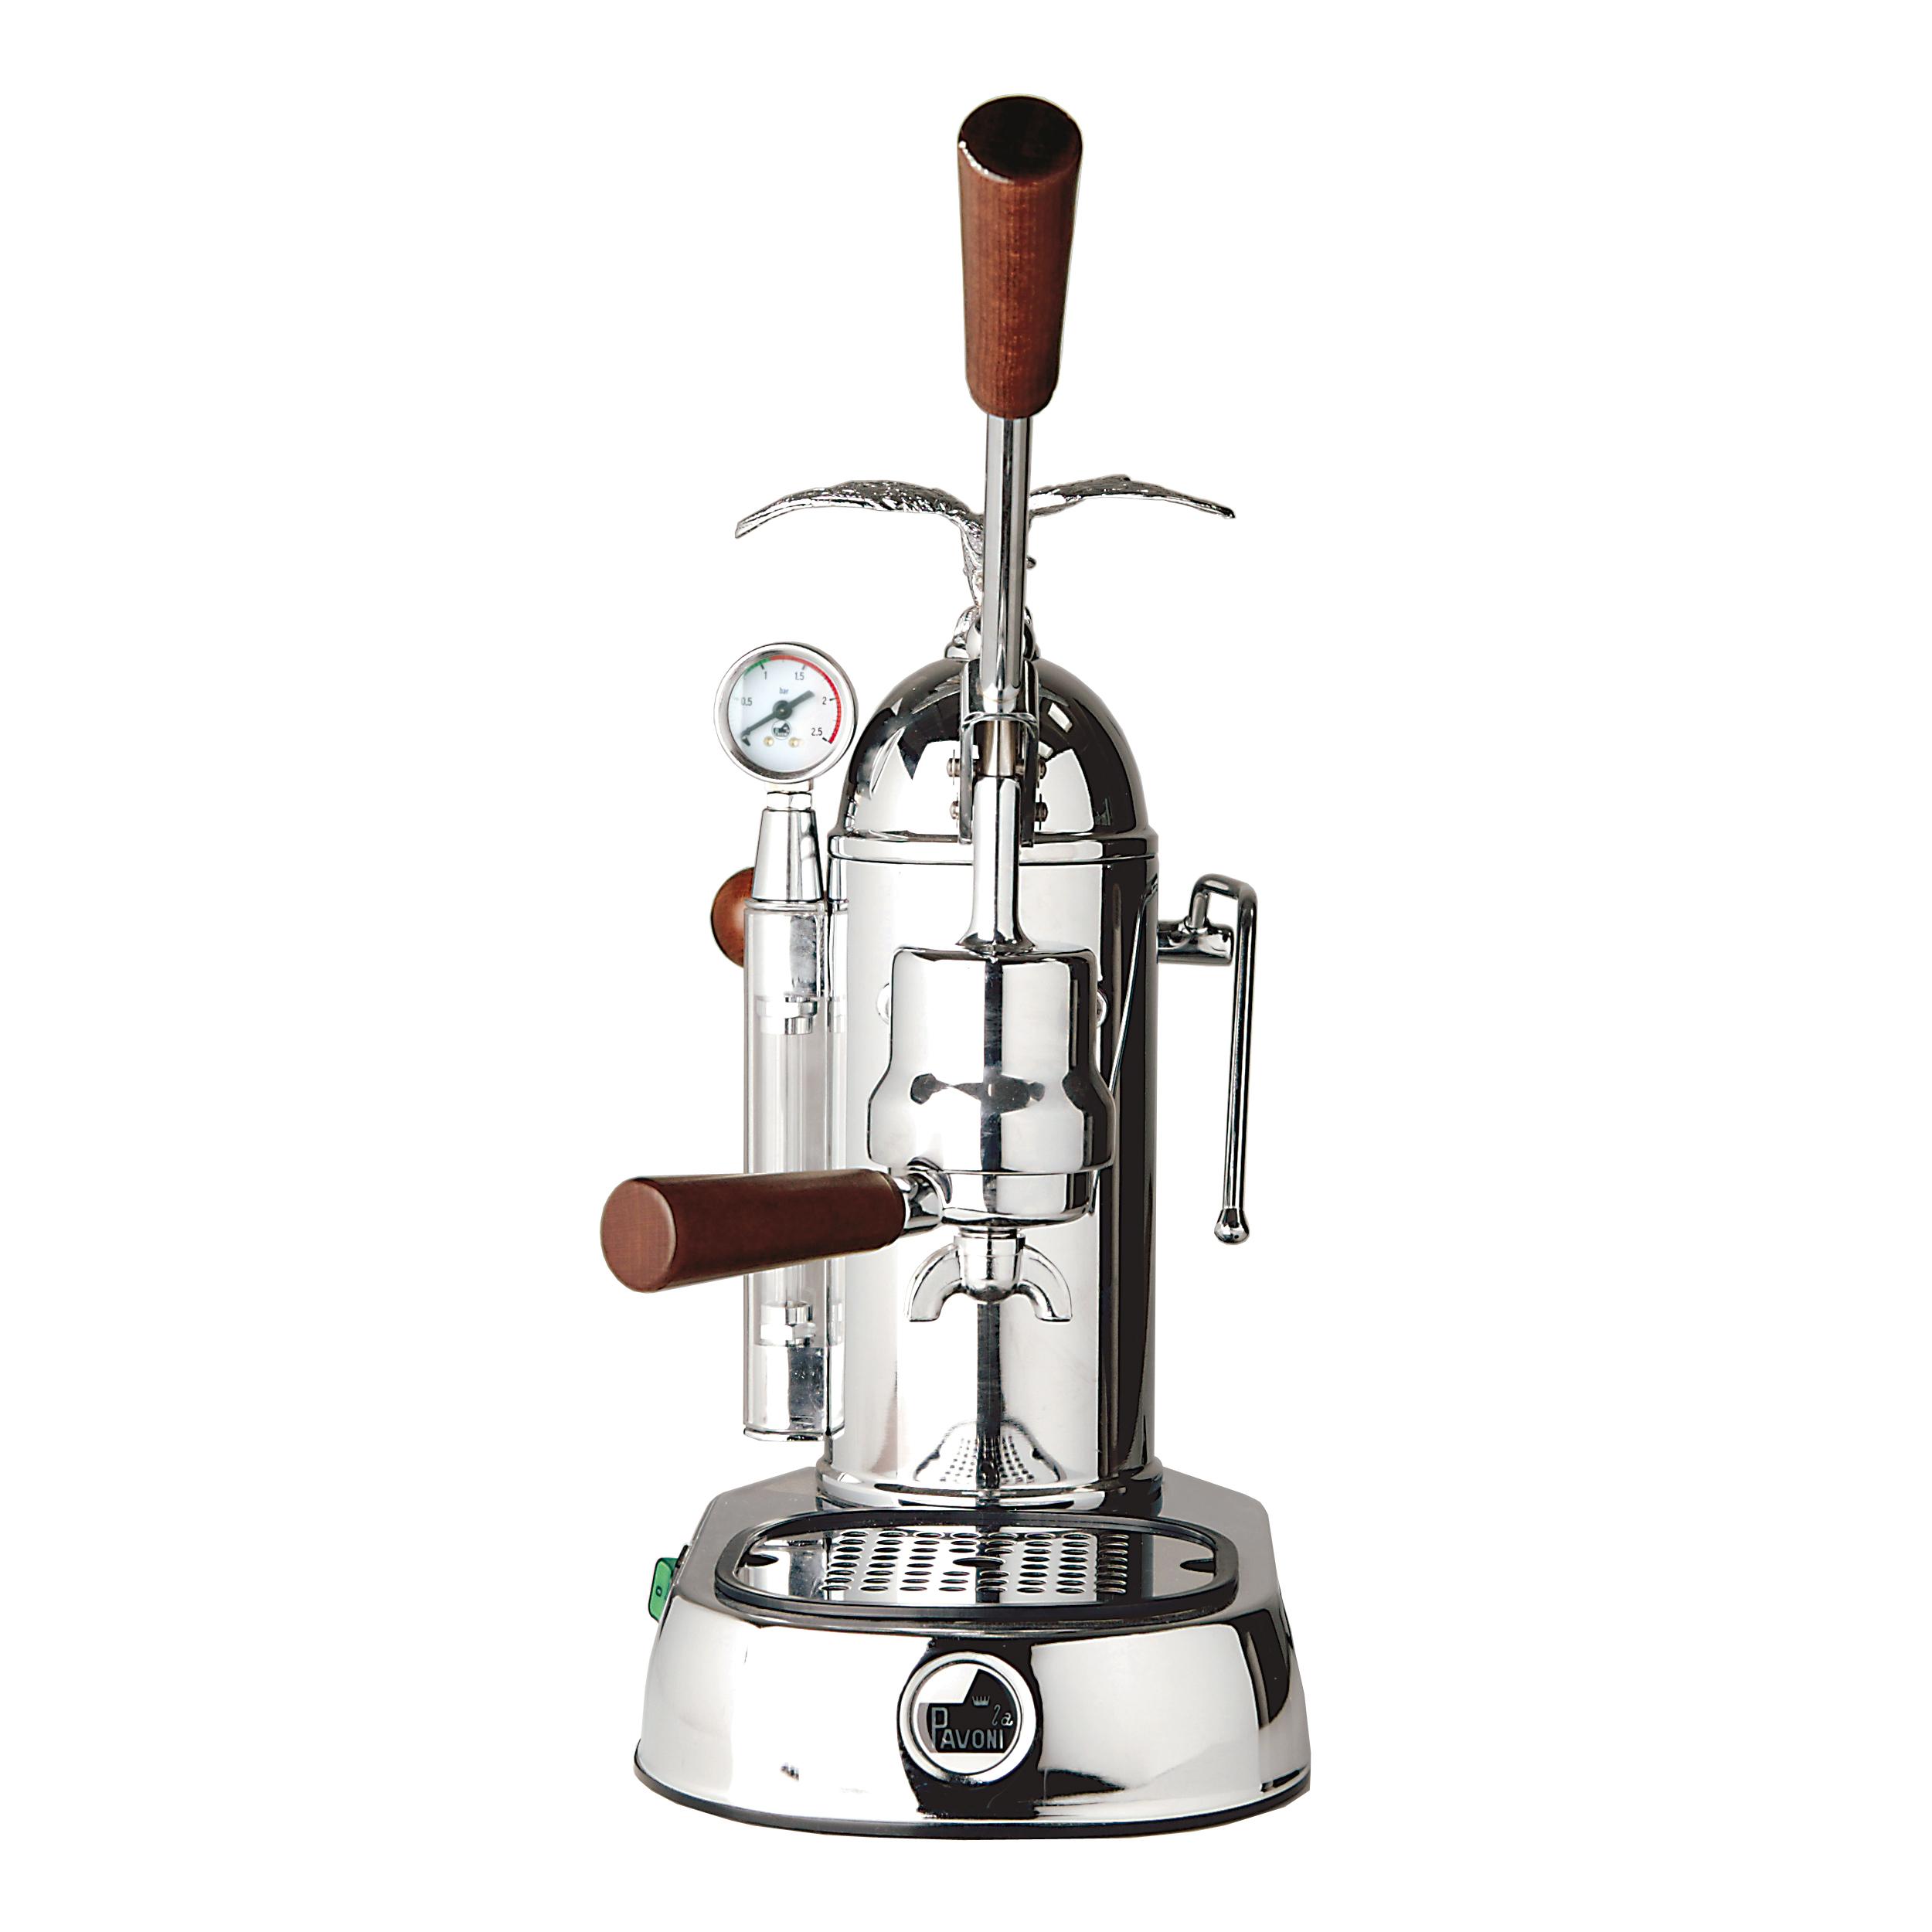 la pavoni gran romantica grl handhebel espressomaschine 8010072082301 ebay. Black Bedroom Furniture Sets. Home Design Ideas